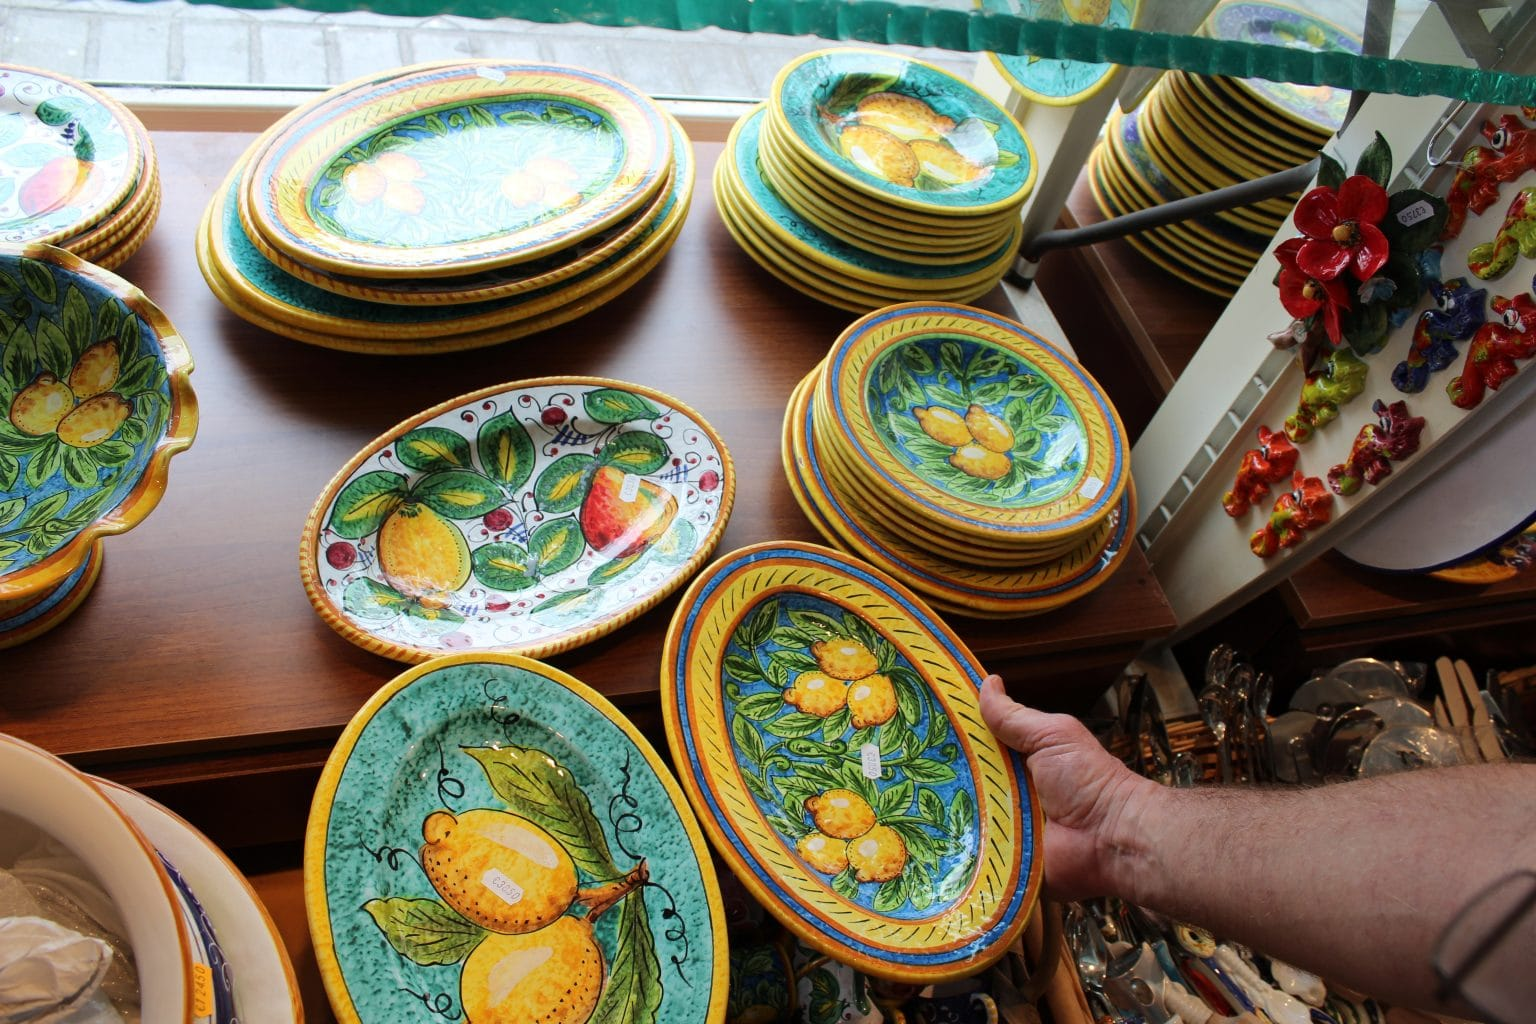 & This History of Italian Ceramics